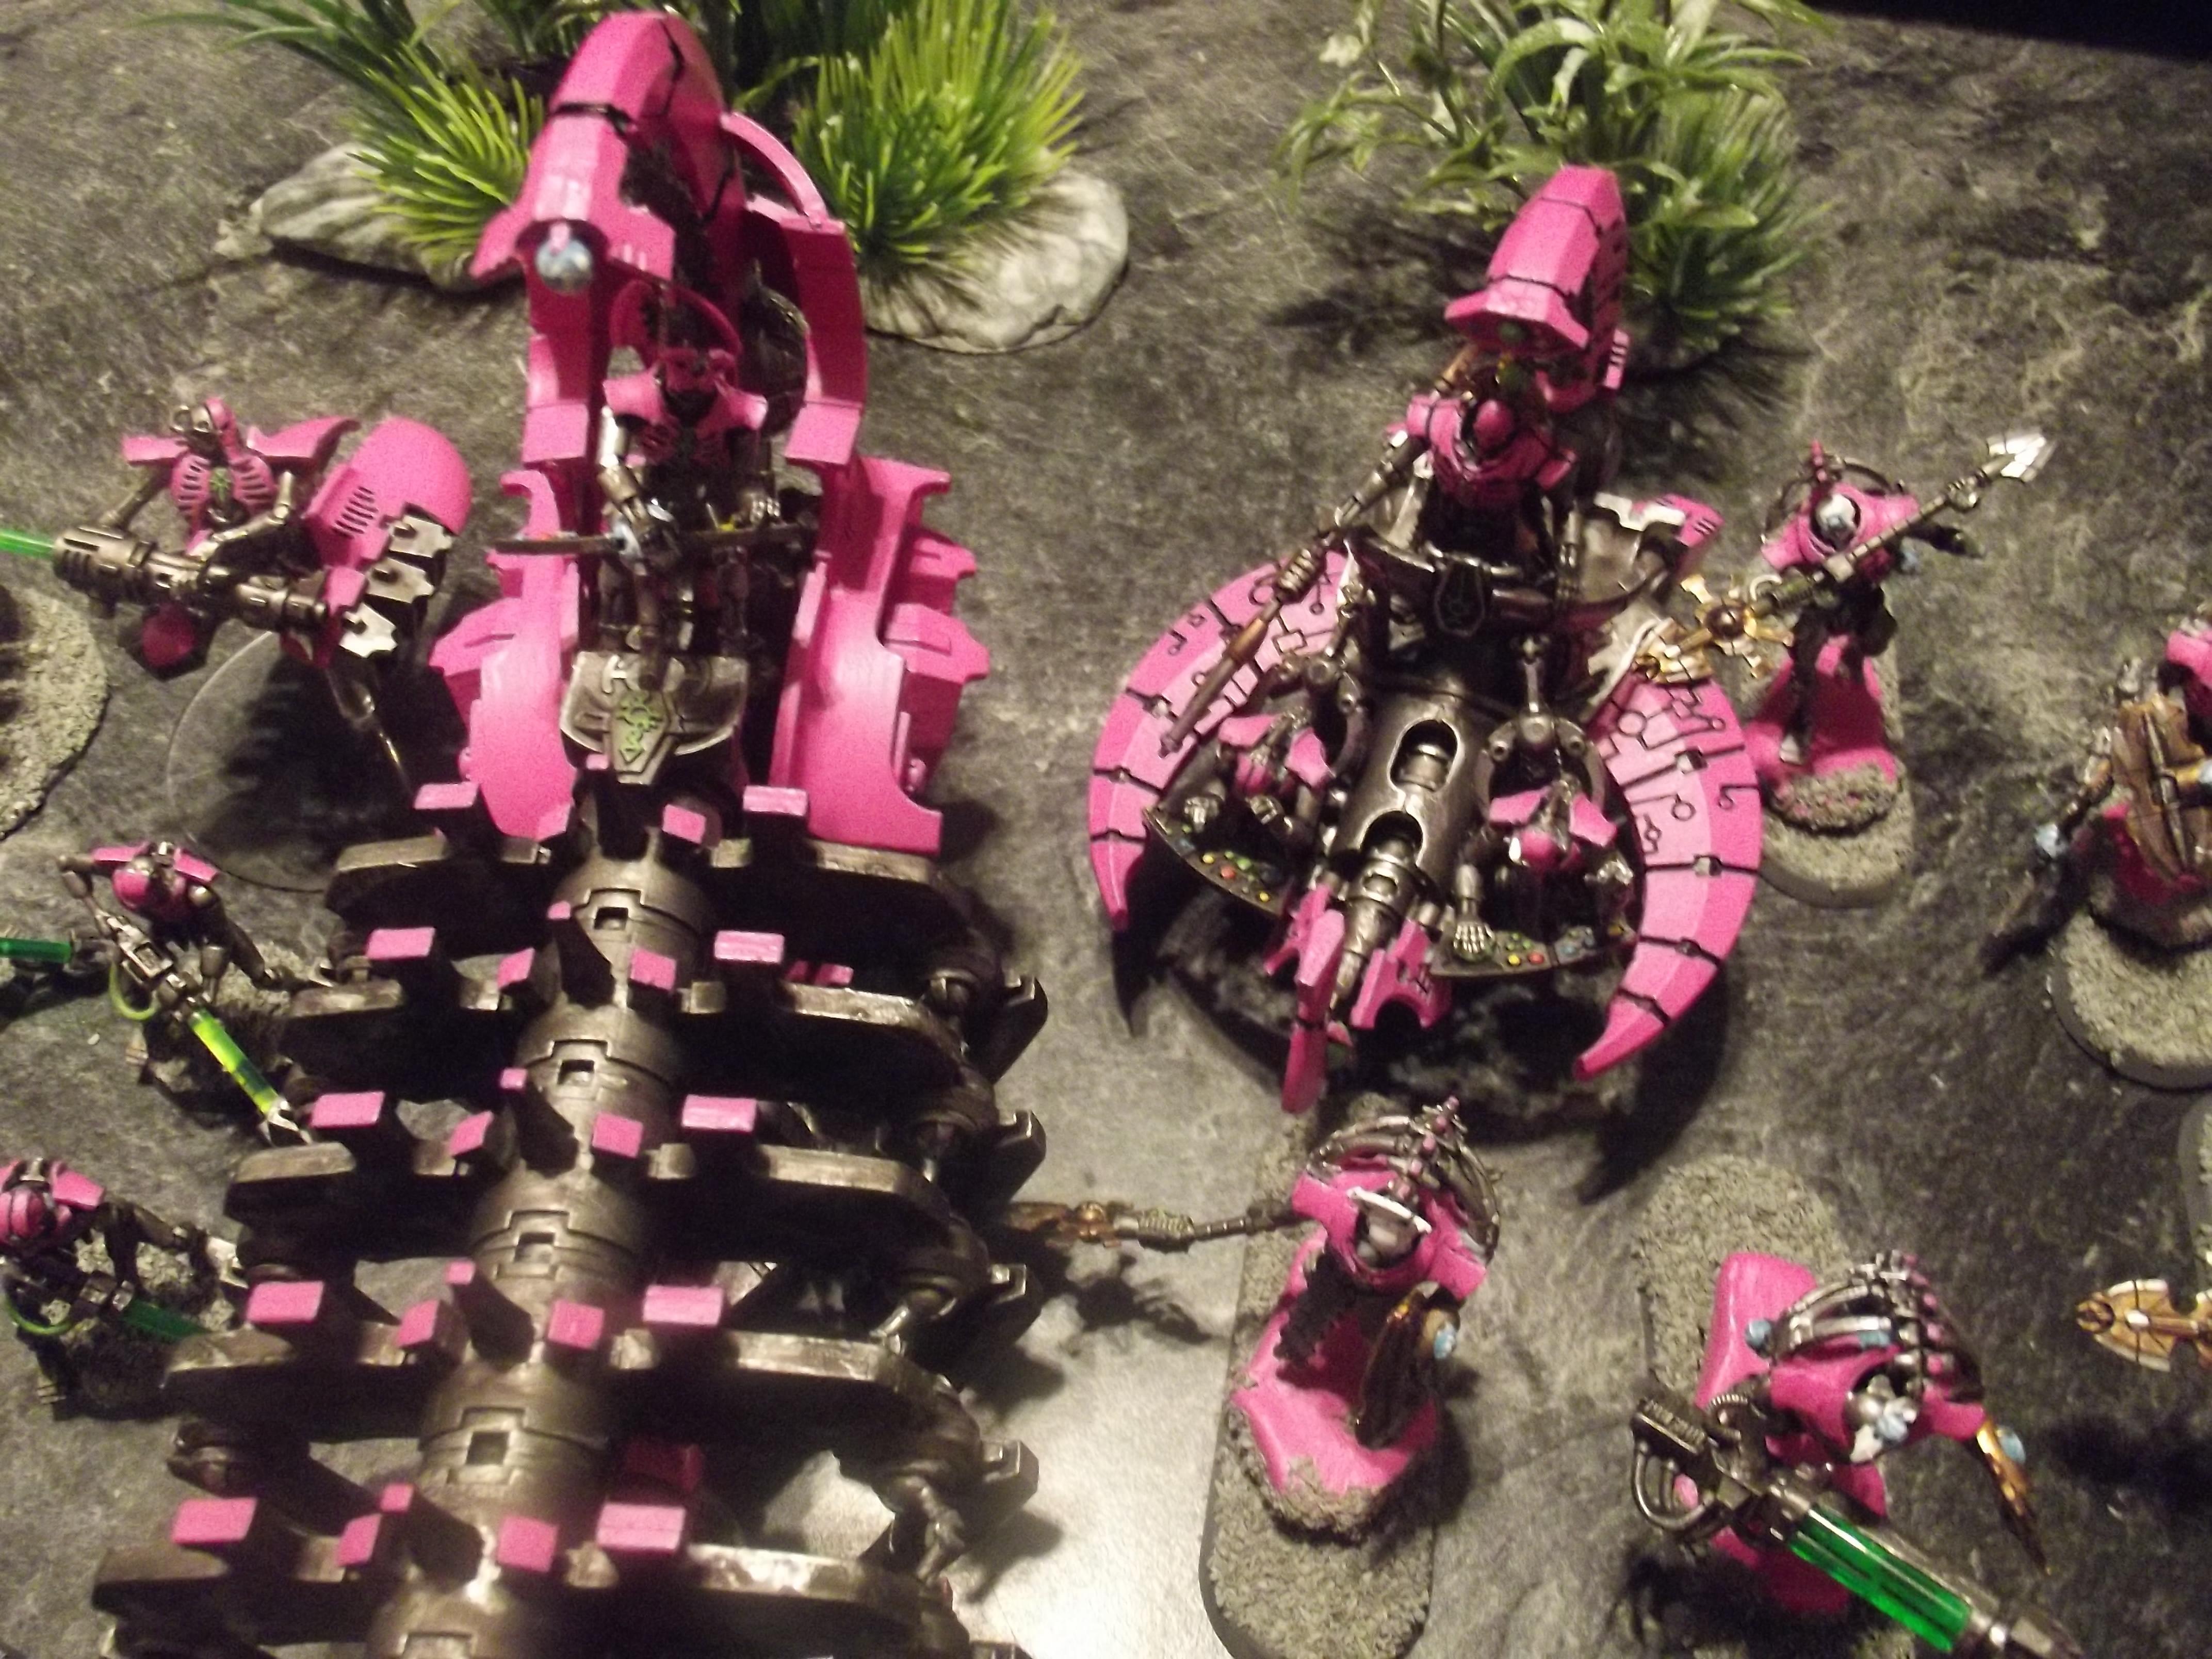 Annihilation, Army, Barge, Command, Detail, Necrons, Pink, Warhammer 40,000